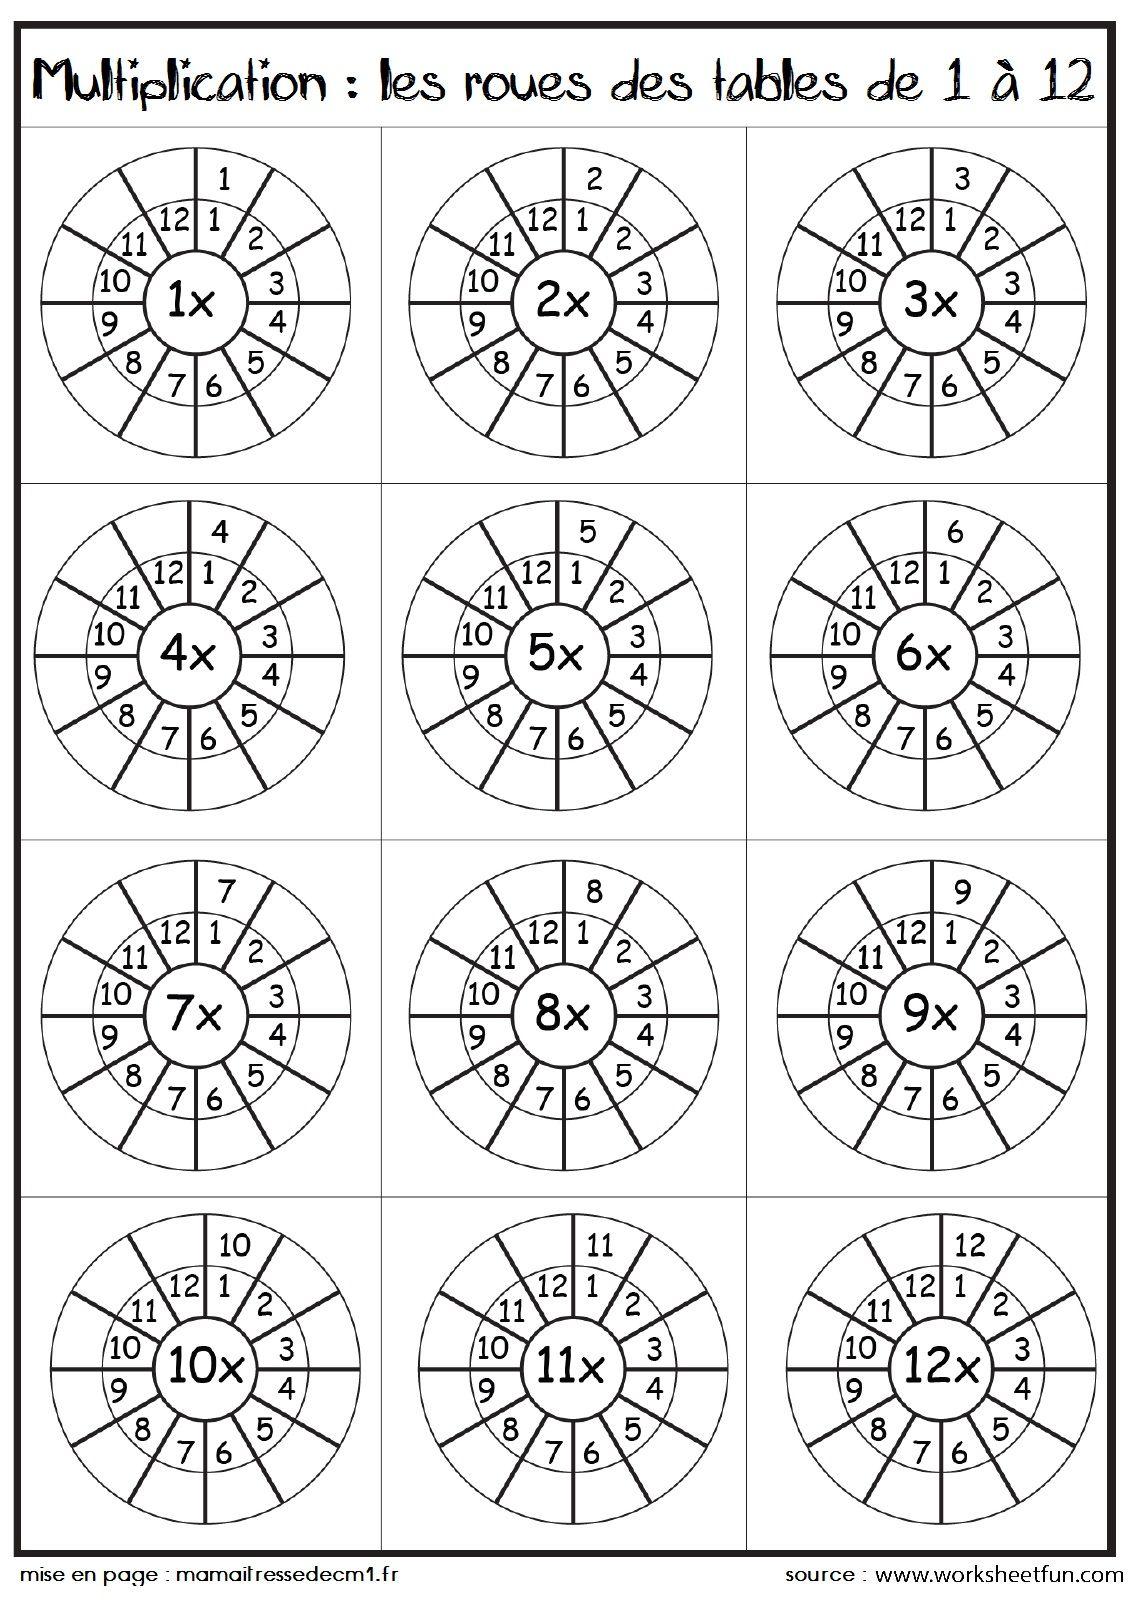 Epingle Sur Maths Cycle3